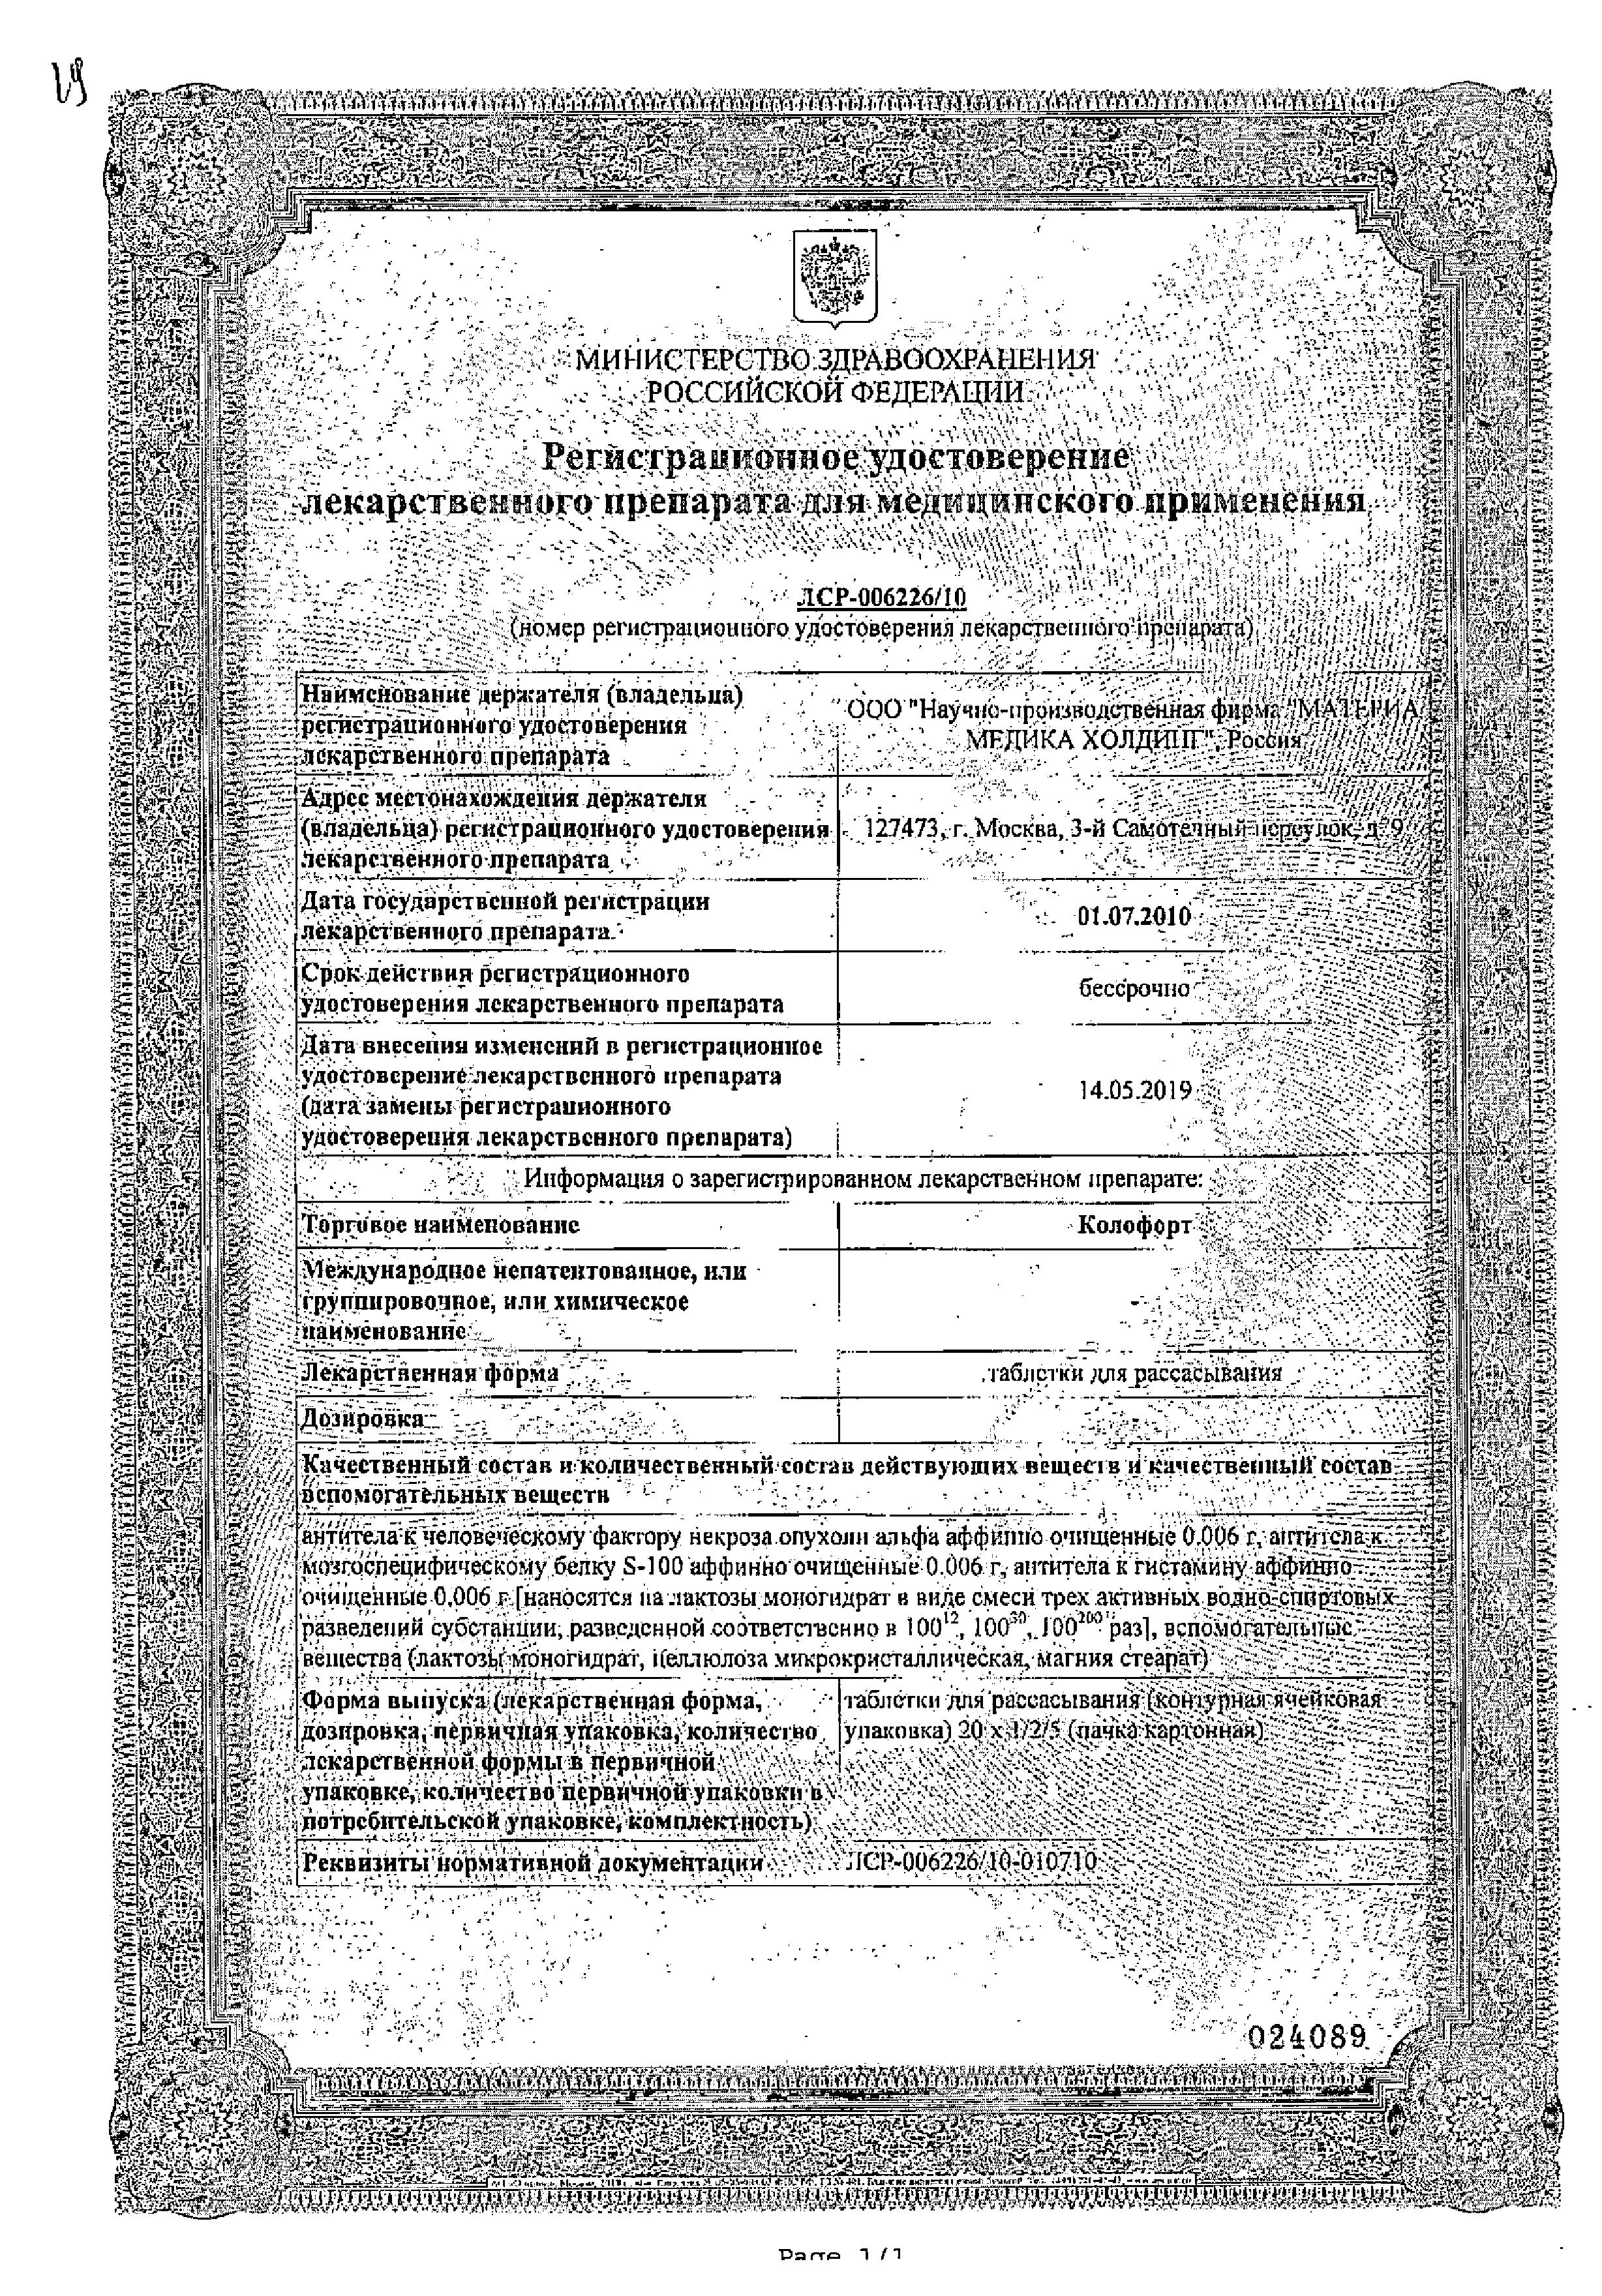 Колофорт сертификат